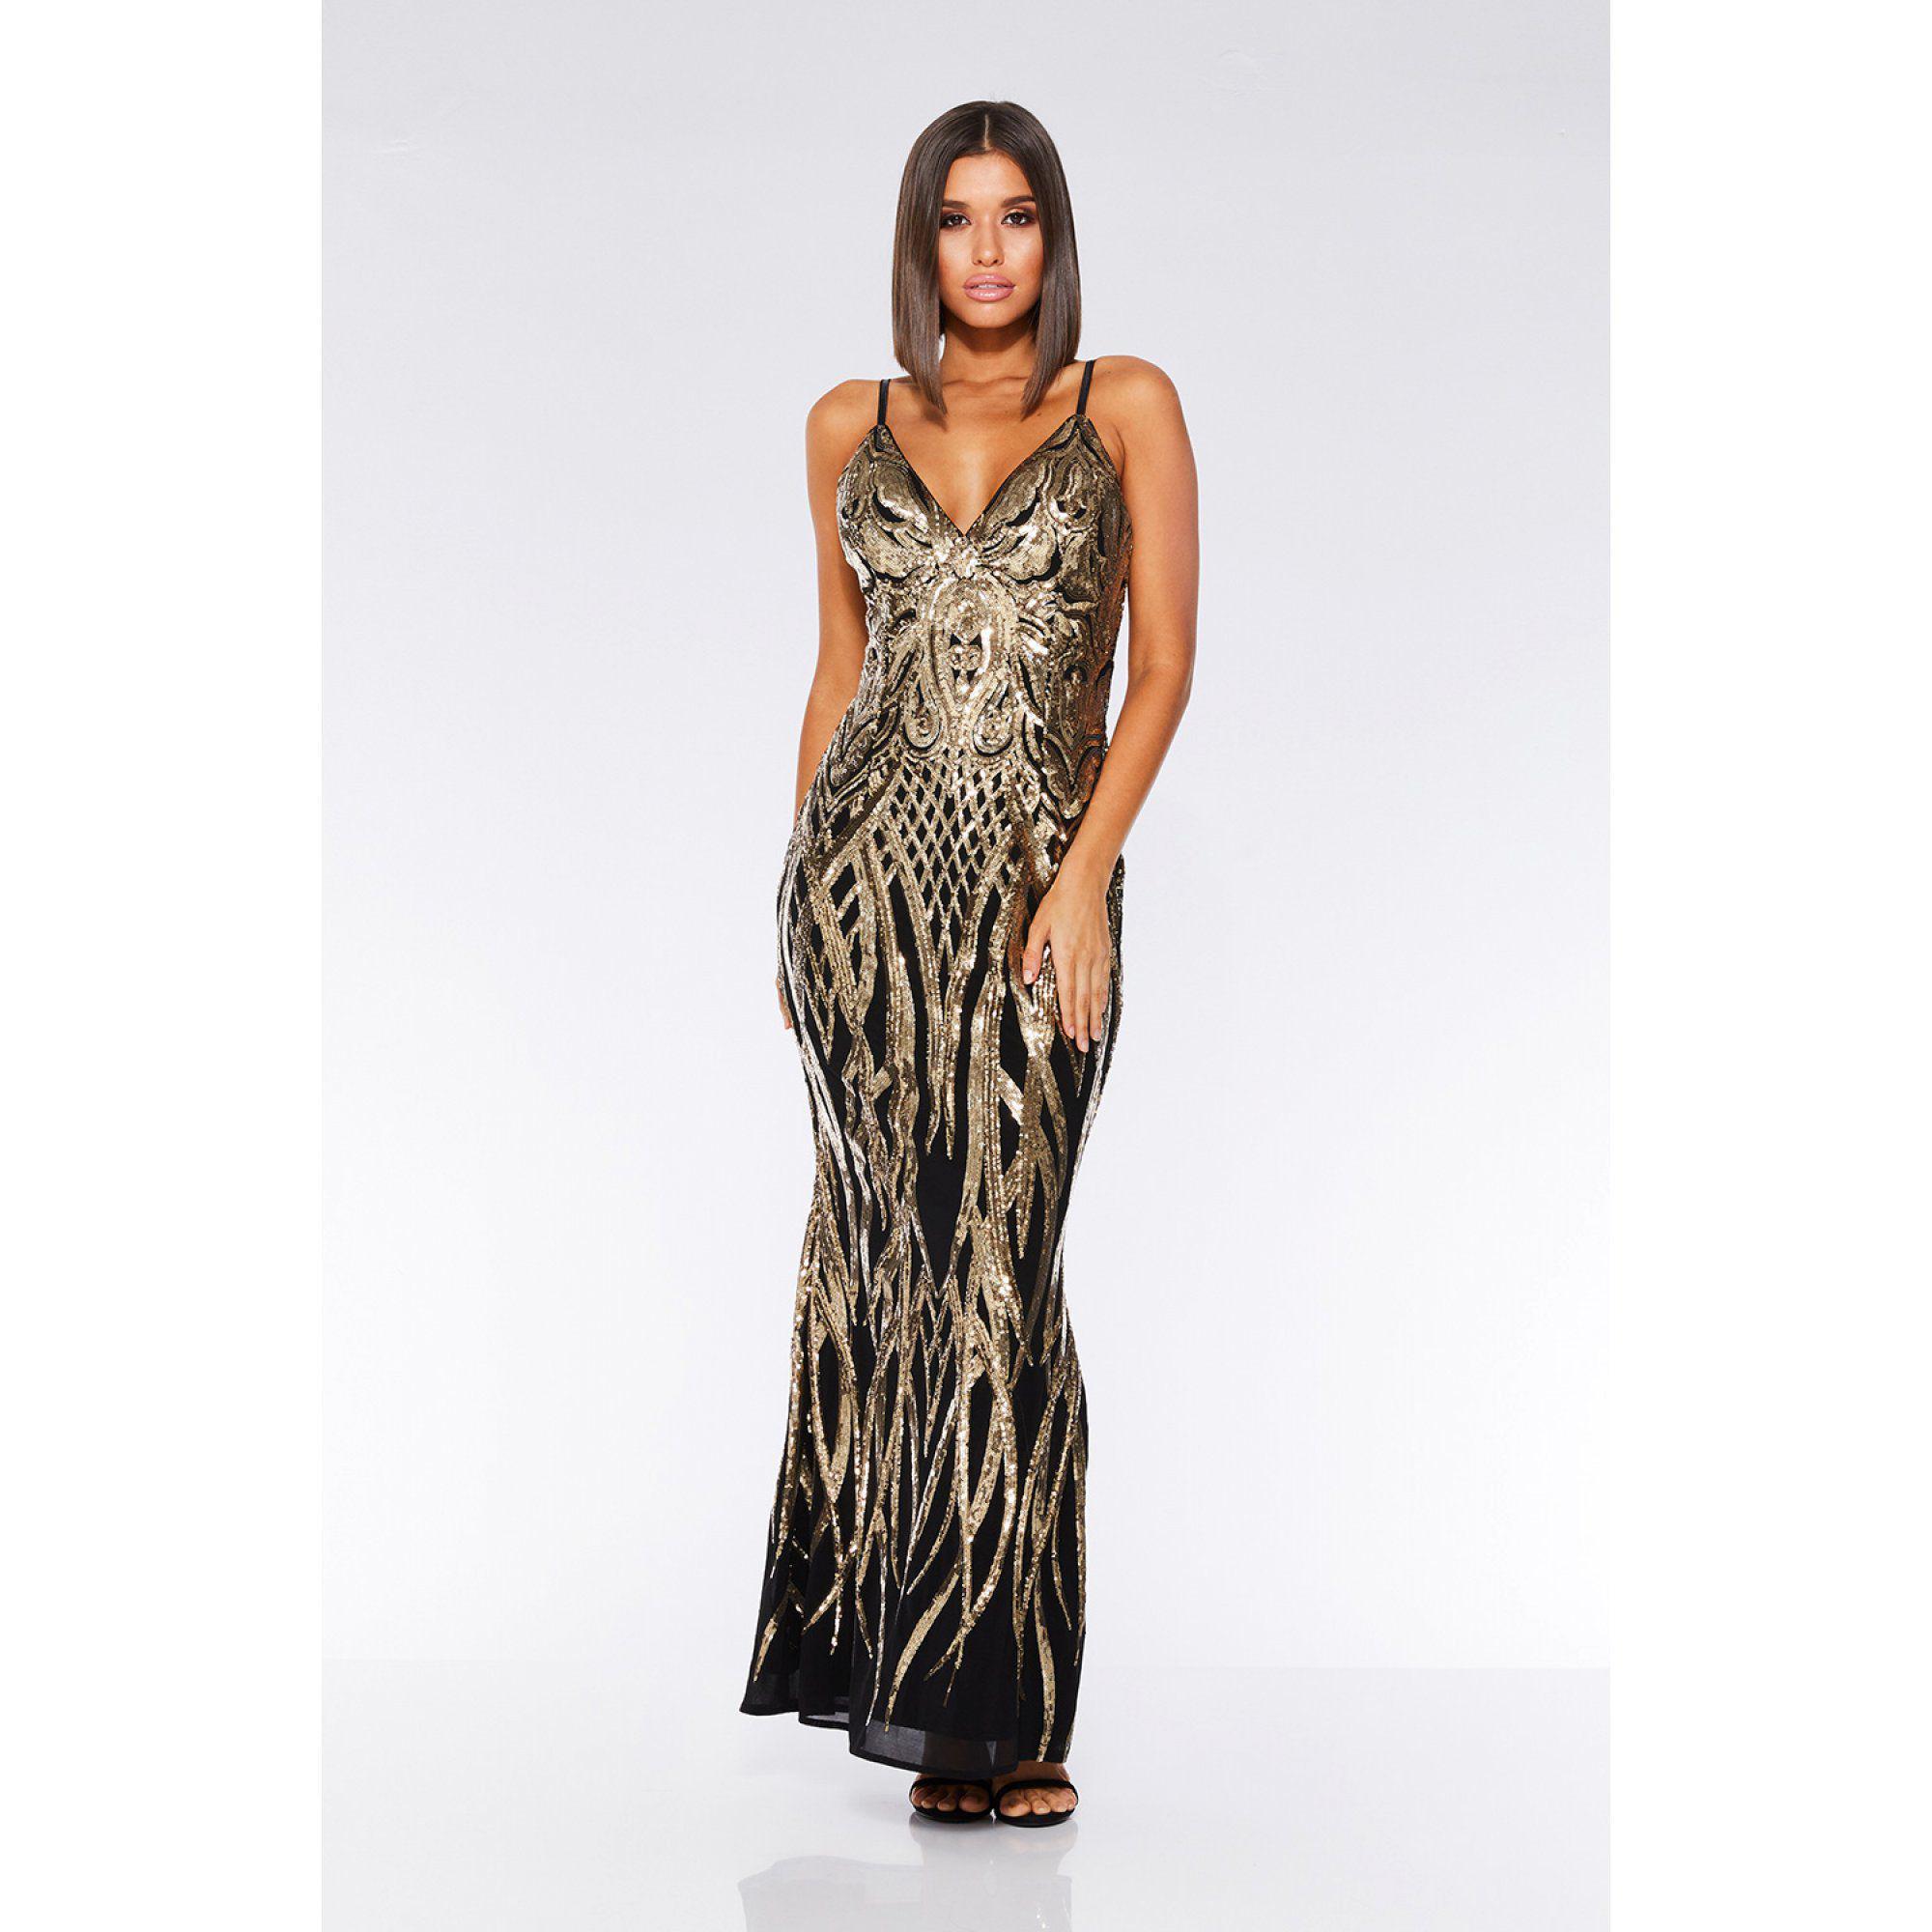 d61be8688e Black And Gold Sequin Fishtail Maxi Dress Quiz